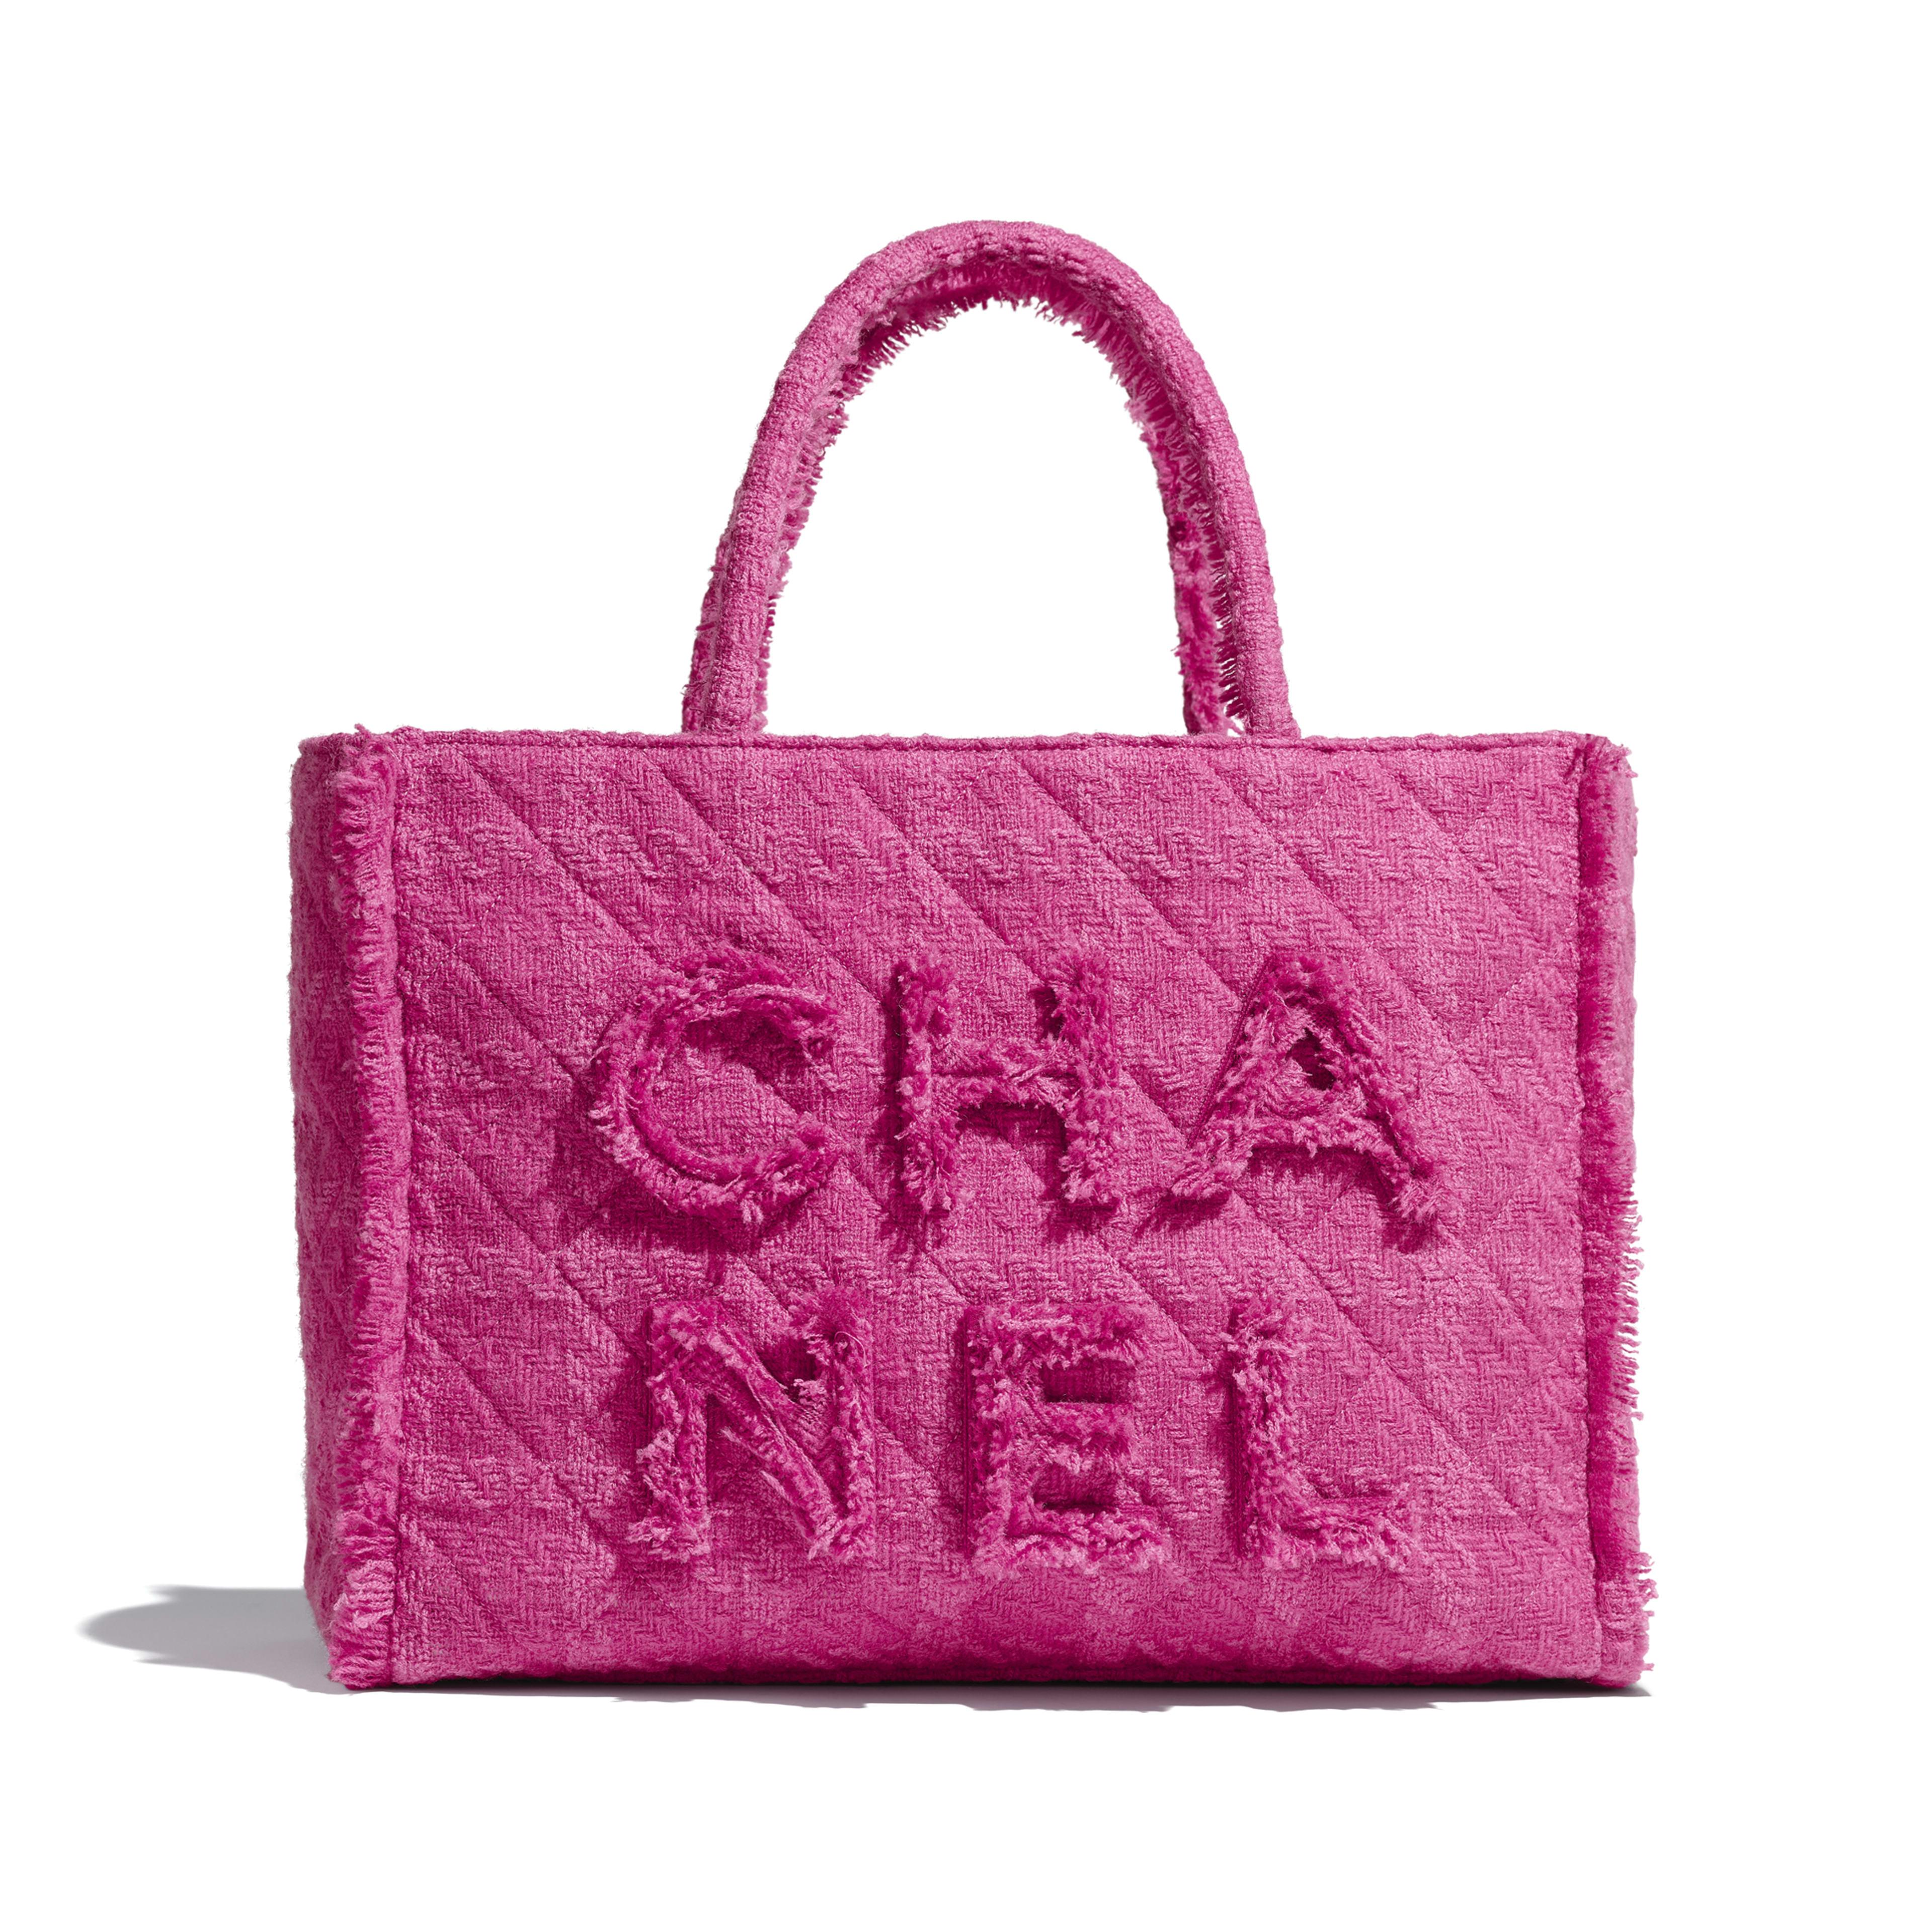 Large Zipped Shopping Bag - Pink - Wool Tweed & Gold-Tone Metal - Default view - see full sized version